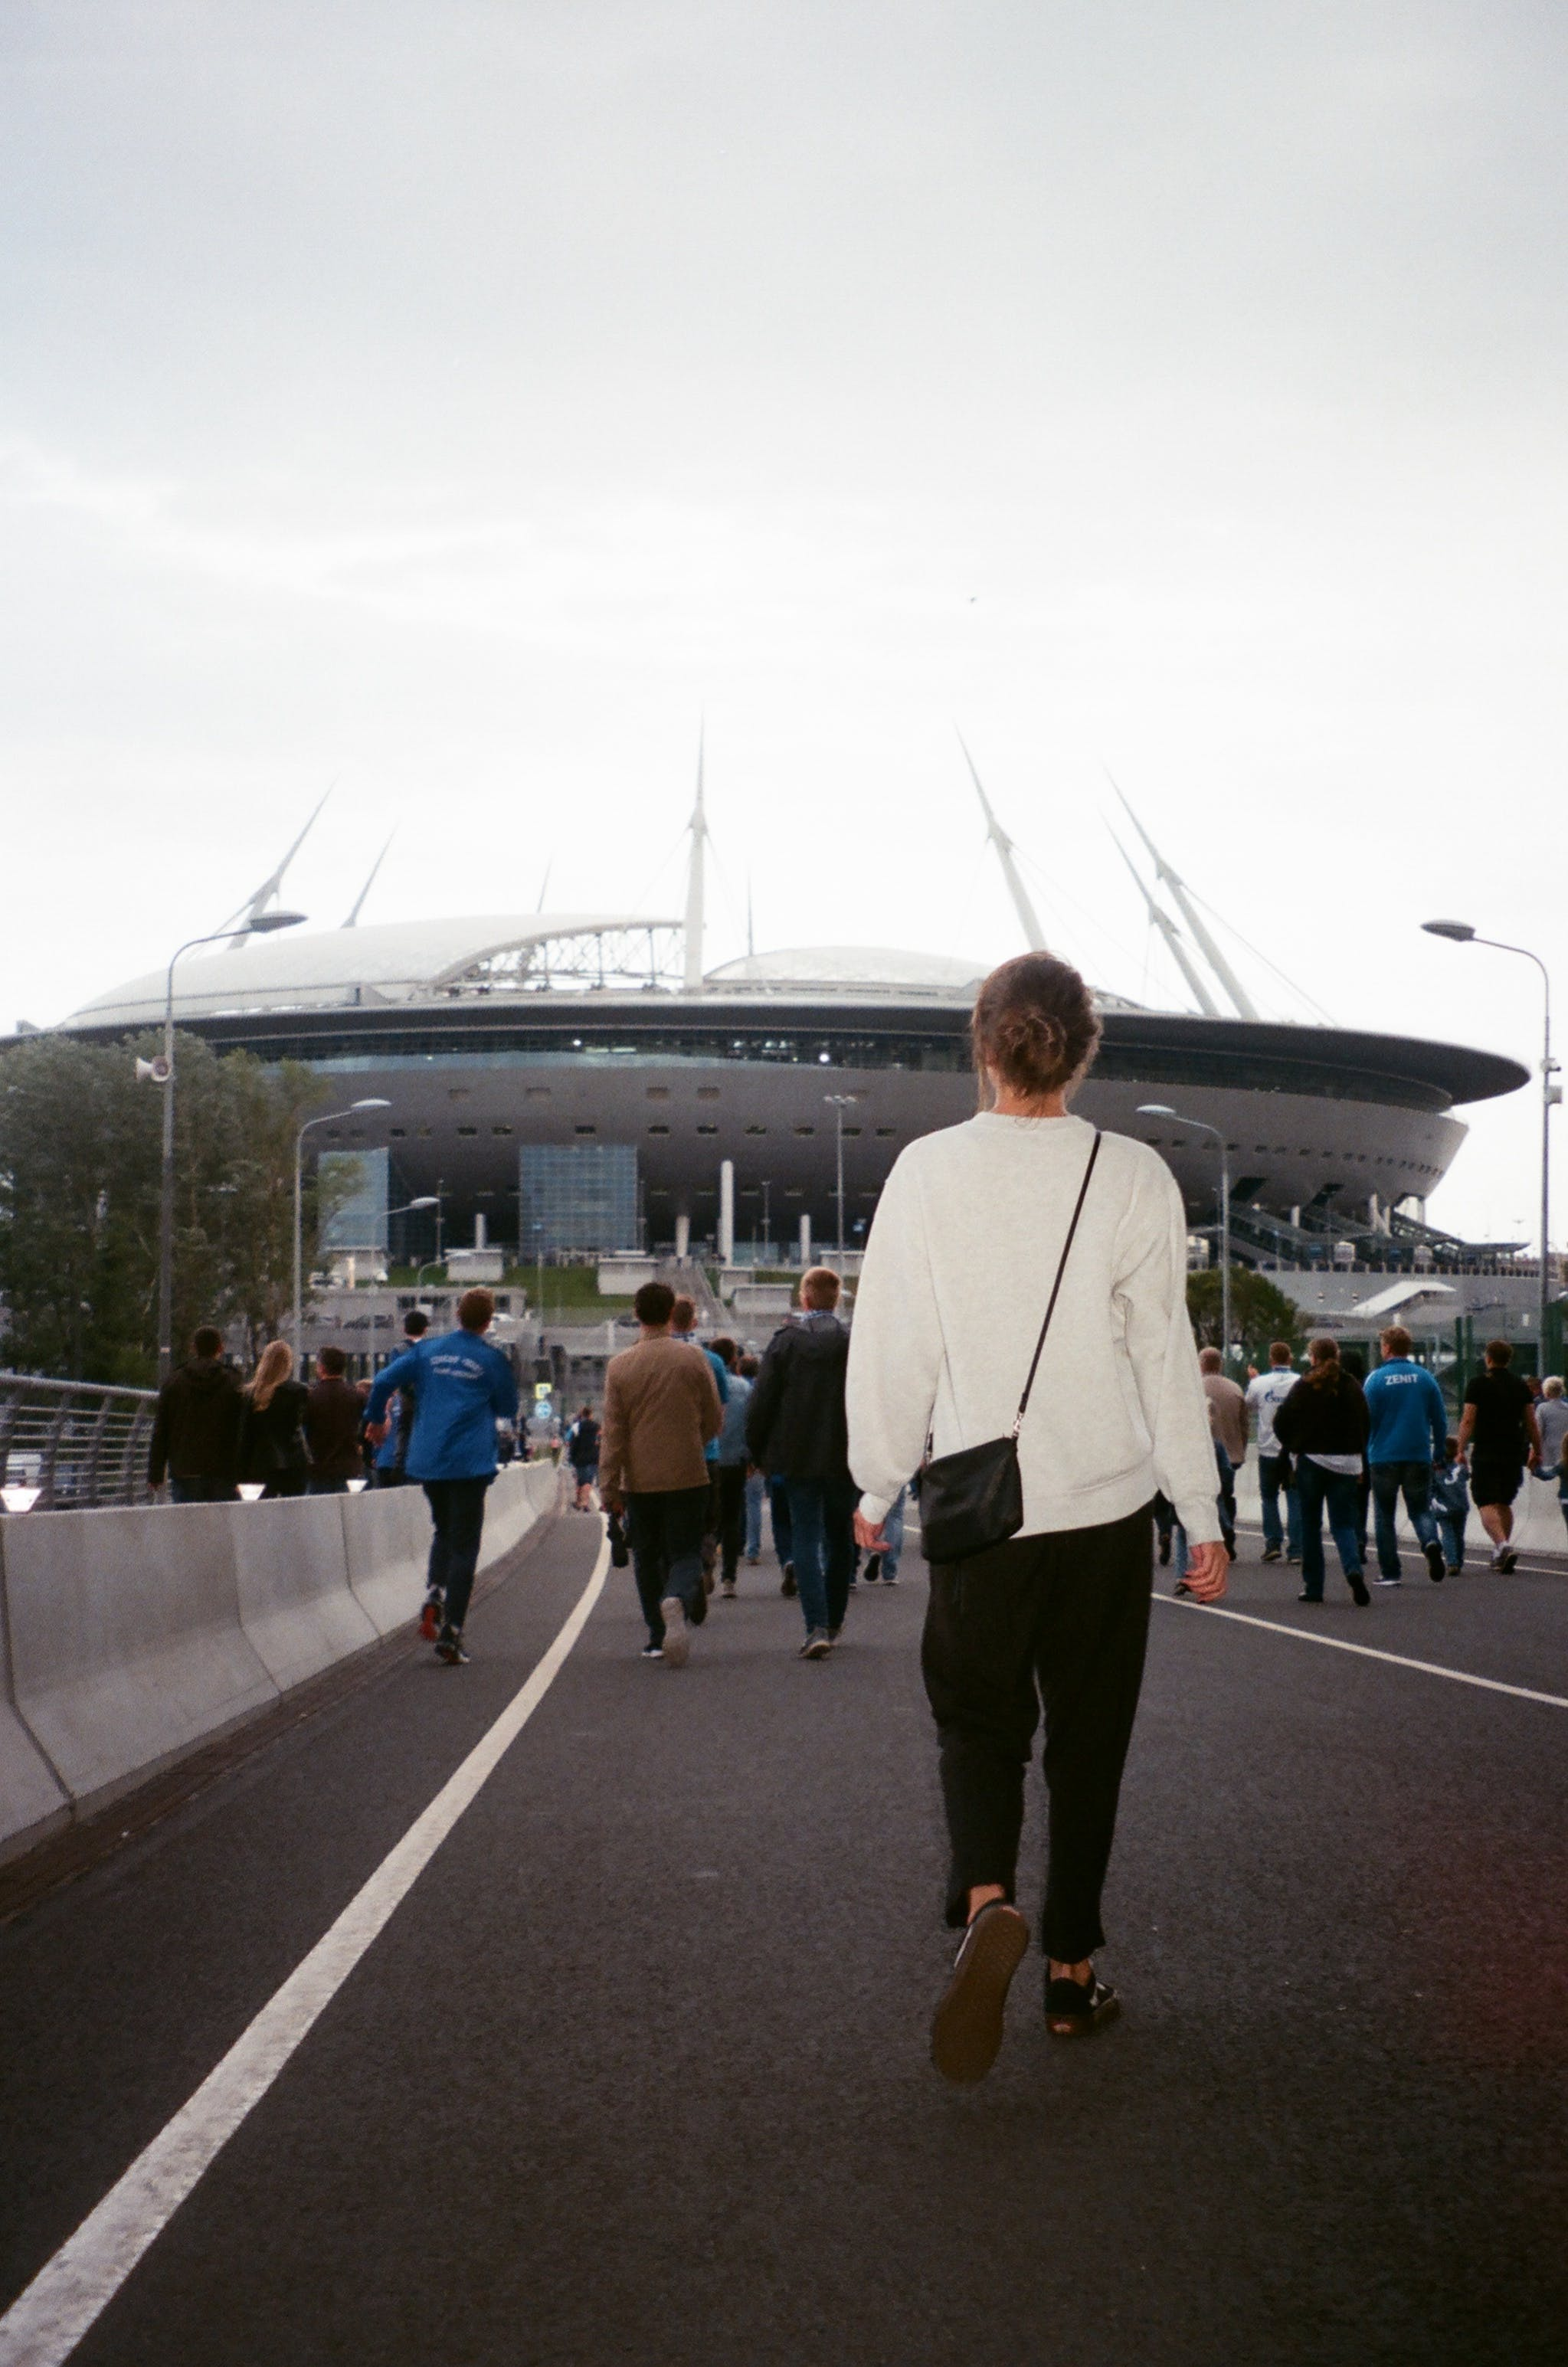 Woman in White Long-sleeve Top Walking to Stadium